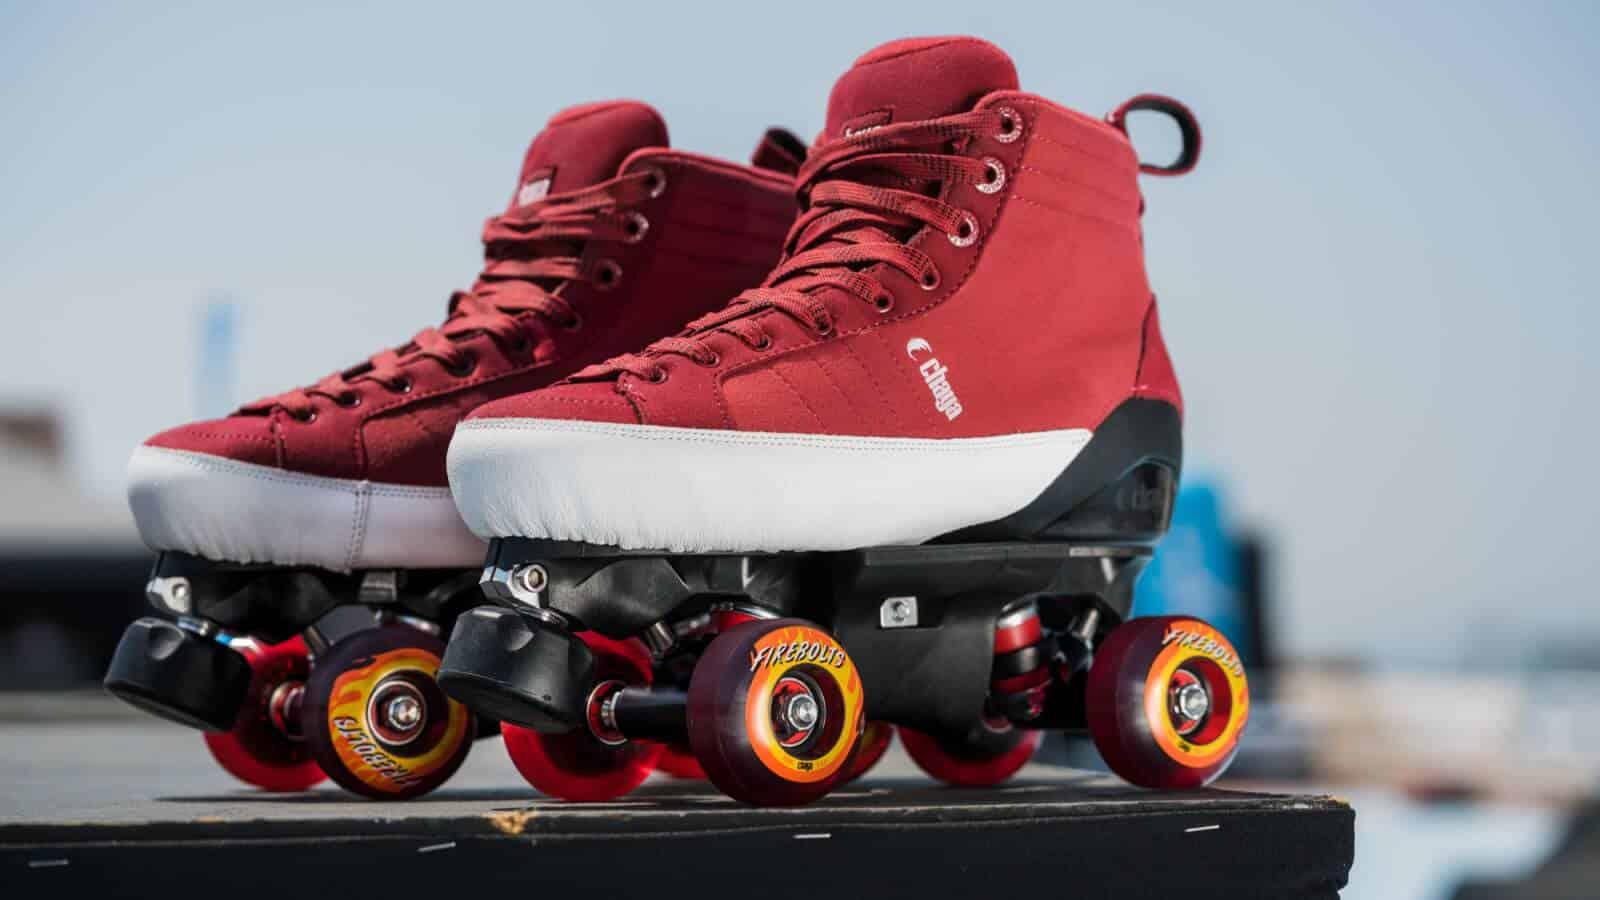 CHAYA Karma Pro Park Roller Skates Burgund